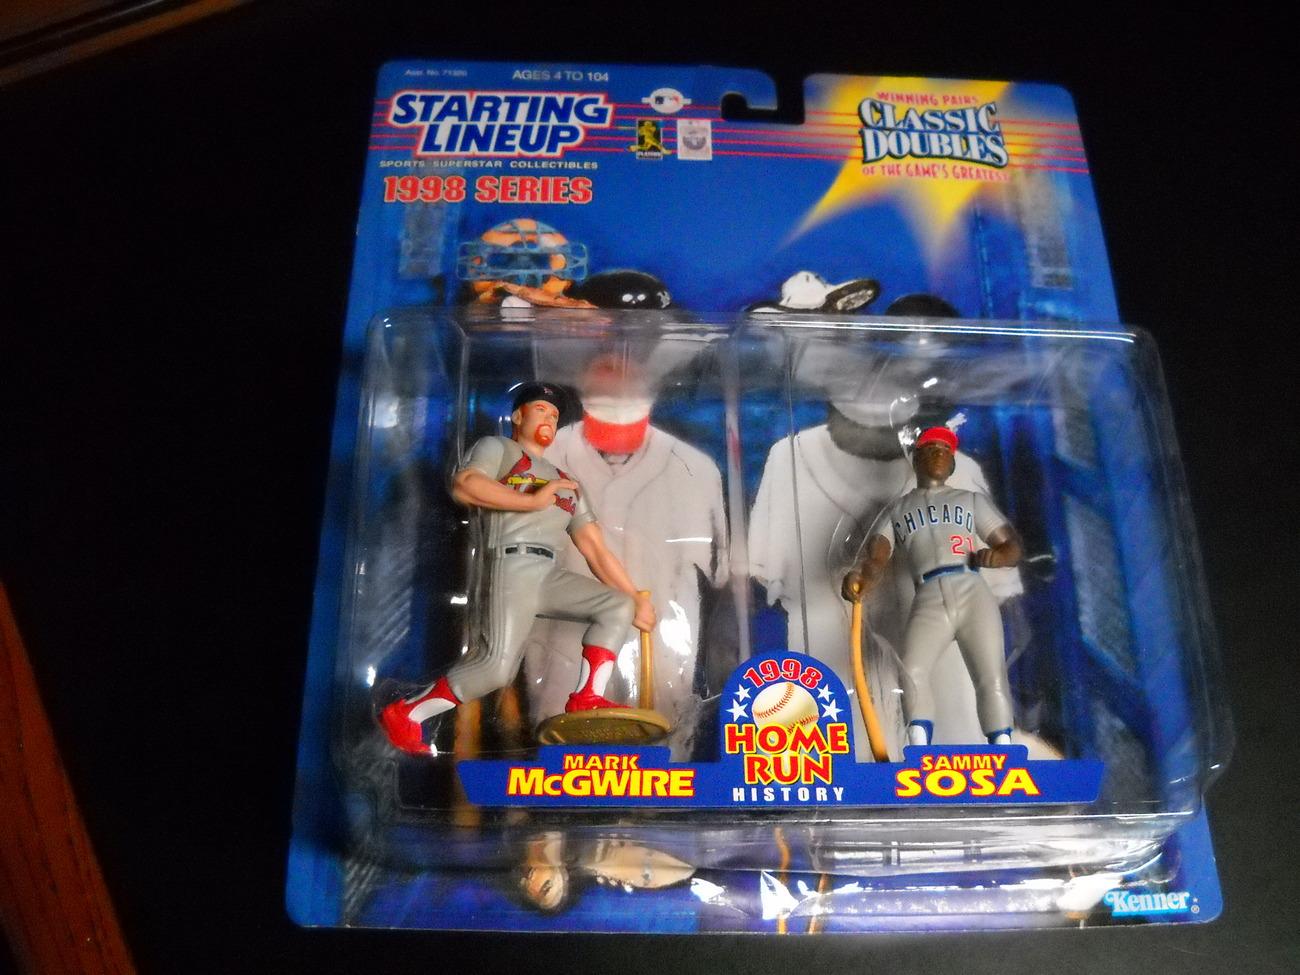 Sport memorabilia starting lineup 1998 series mcgwire   sosa 1998 01